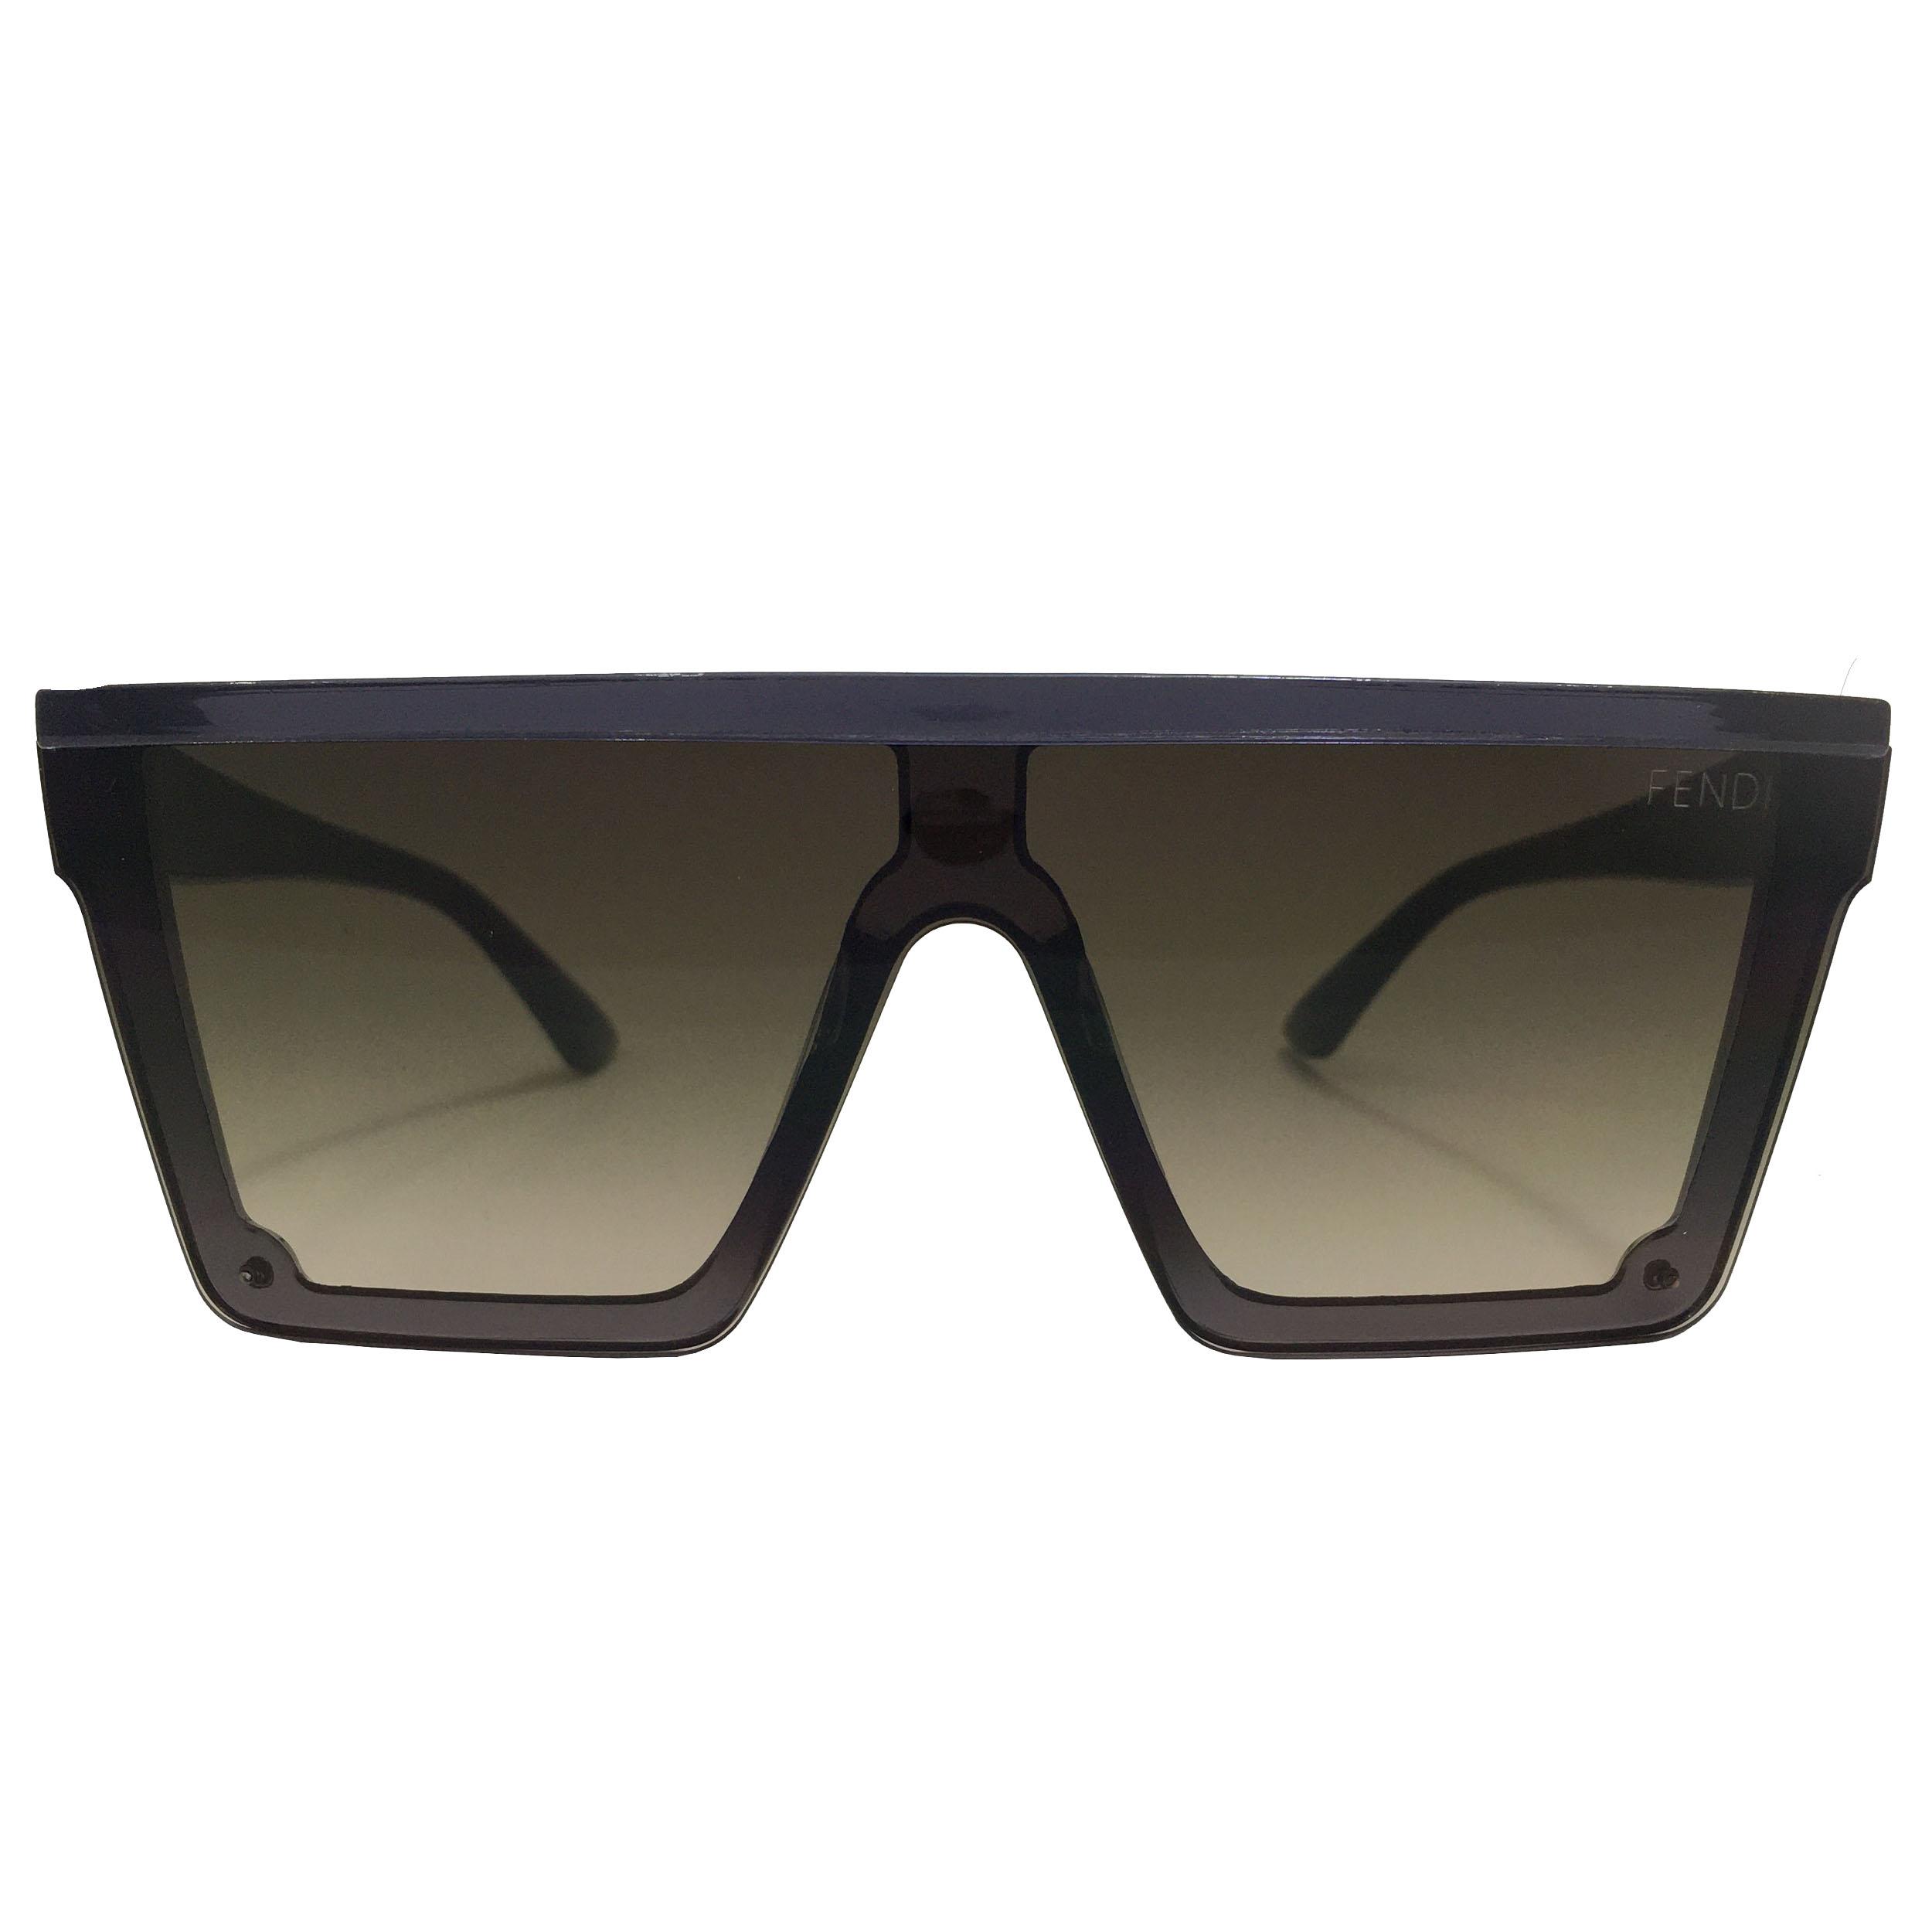 عینک آفتابی  مدل کاپرا                     غیر اصل